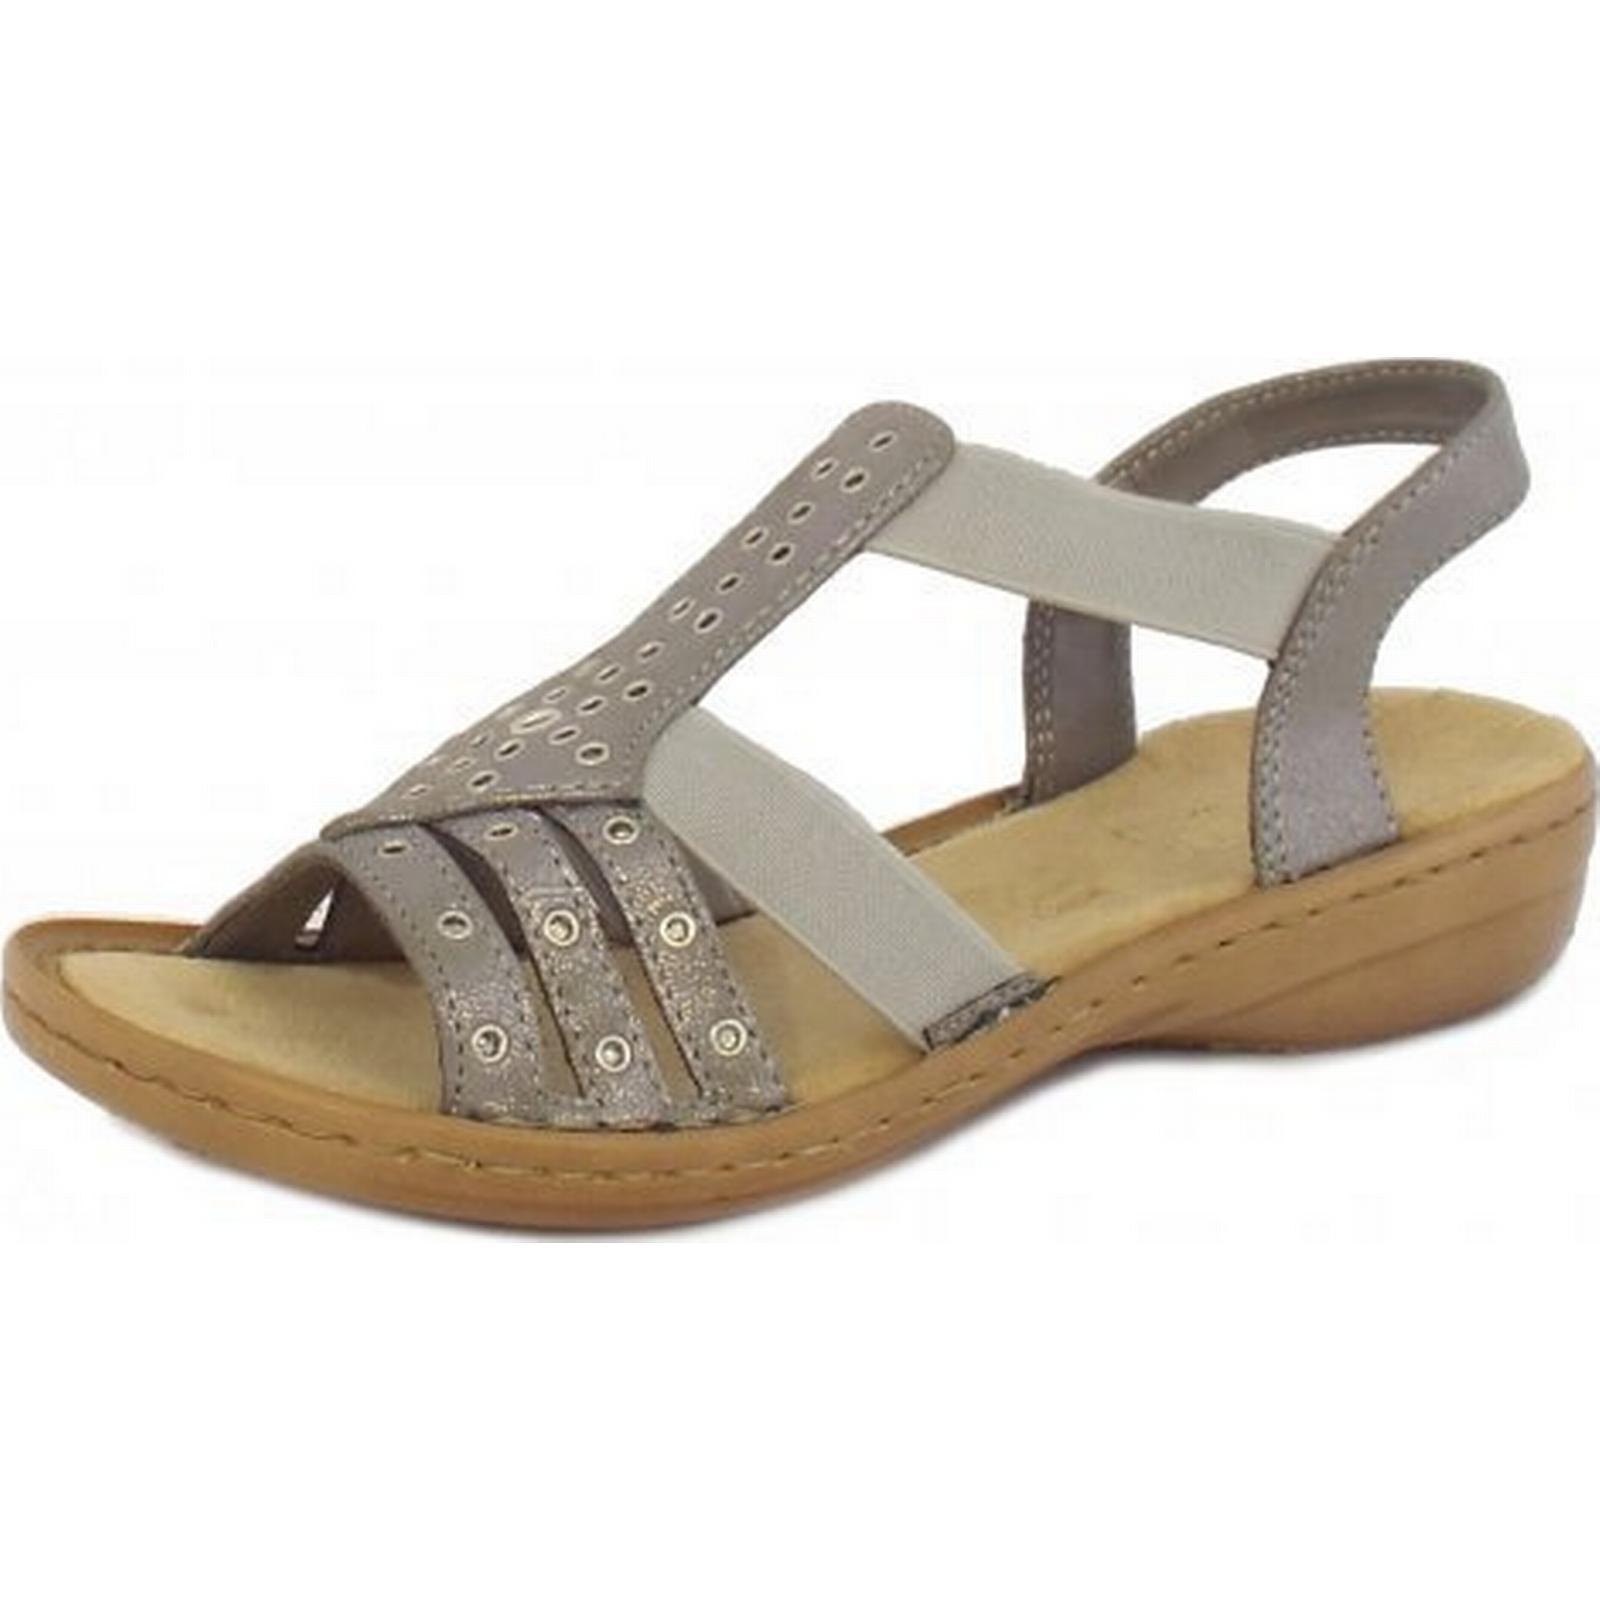 Rieker Janis Ladies Stretch Sandals Sandals Stretch in Silver  Size: 43, Colour: METAL 2d2297